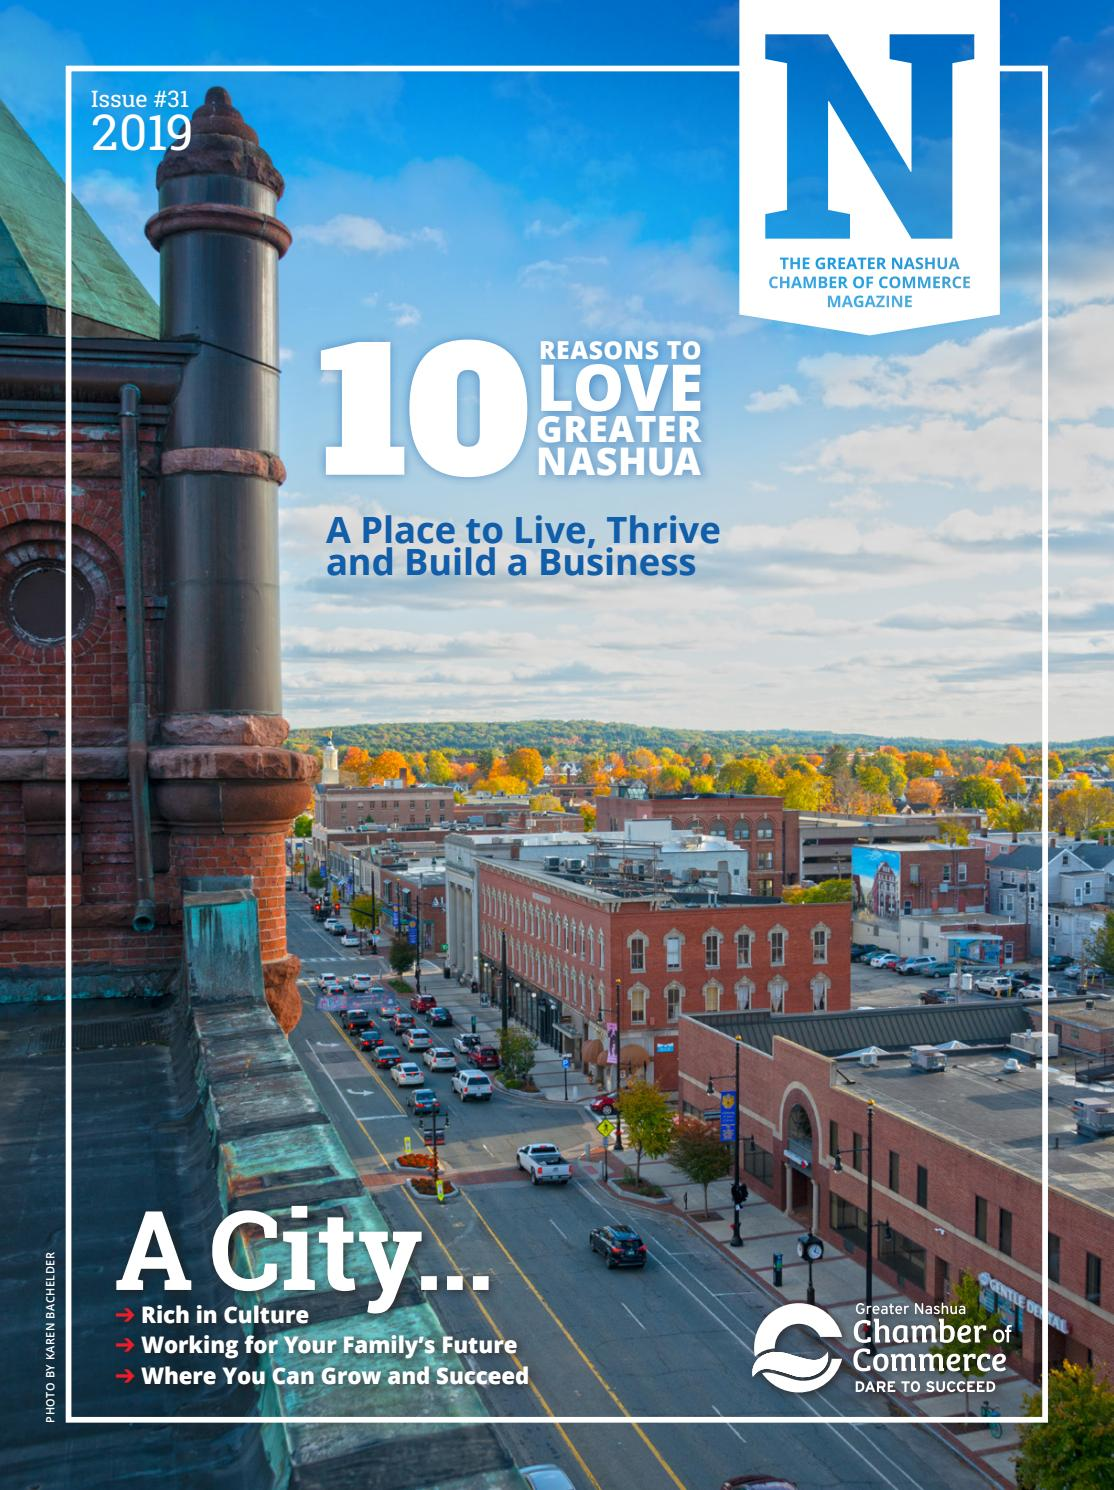 N Magazine 2019 by McLean Communications issuu